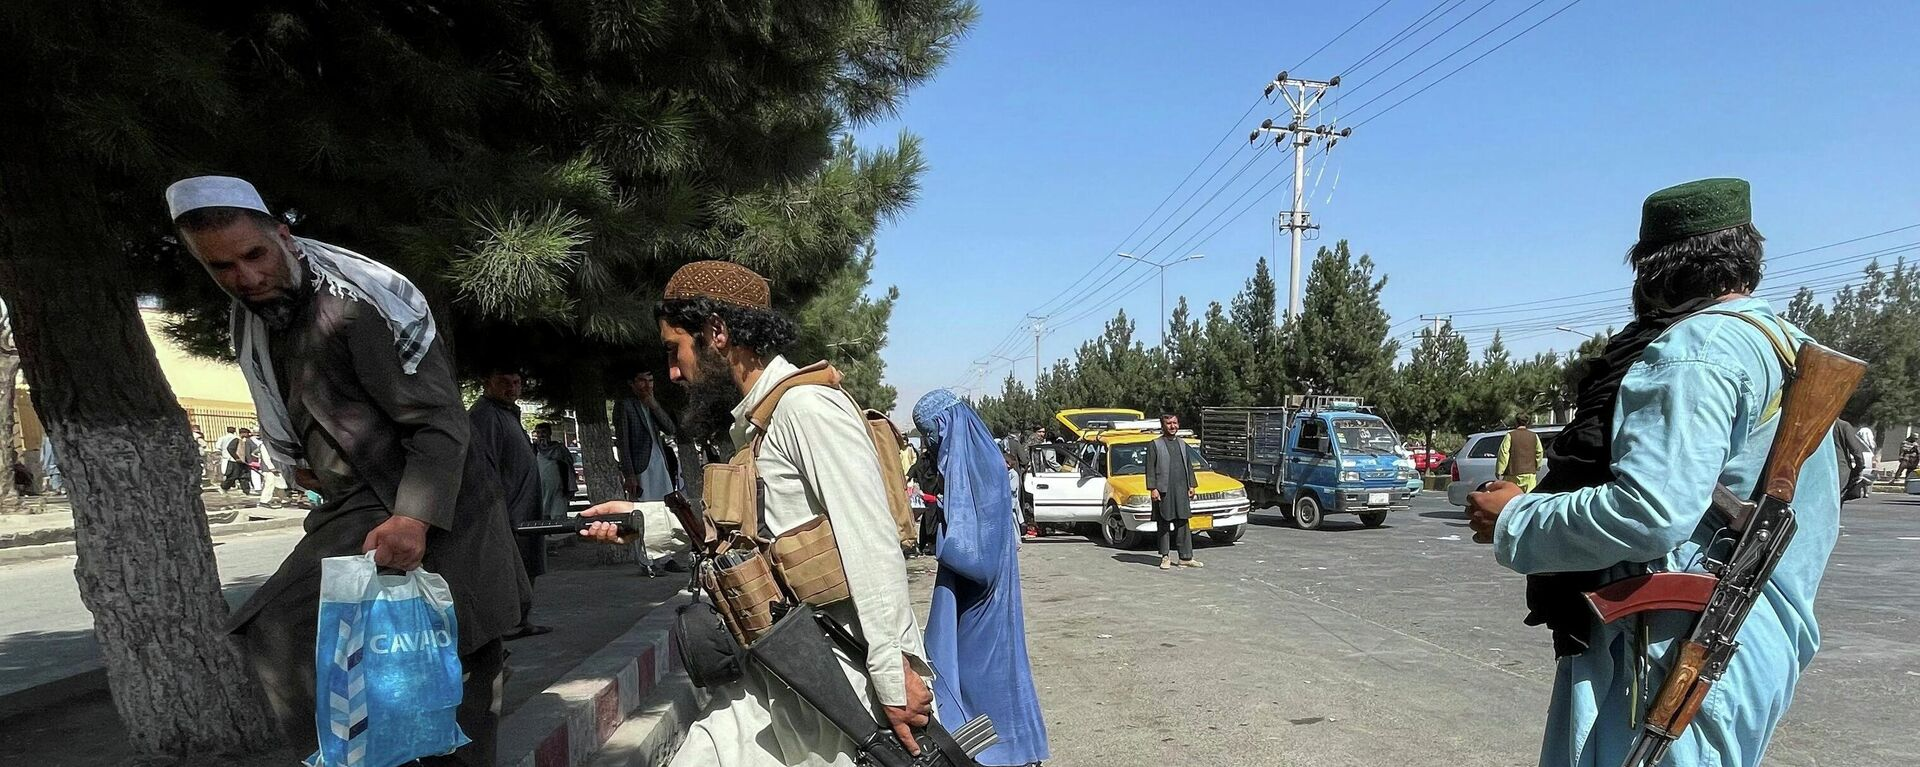 Talibanes en Afganistán - Sputnik Mundo, 1920, 27.08.2021